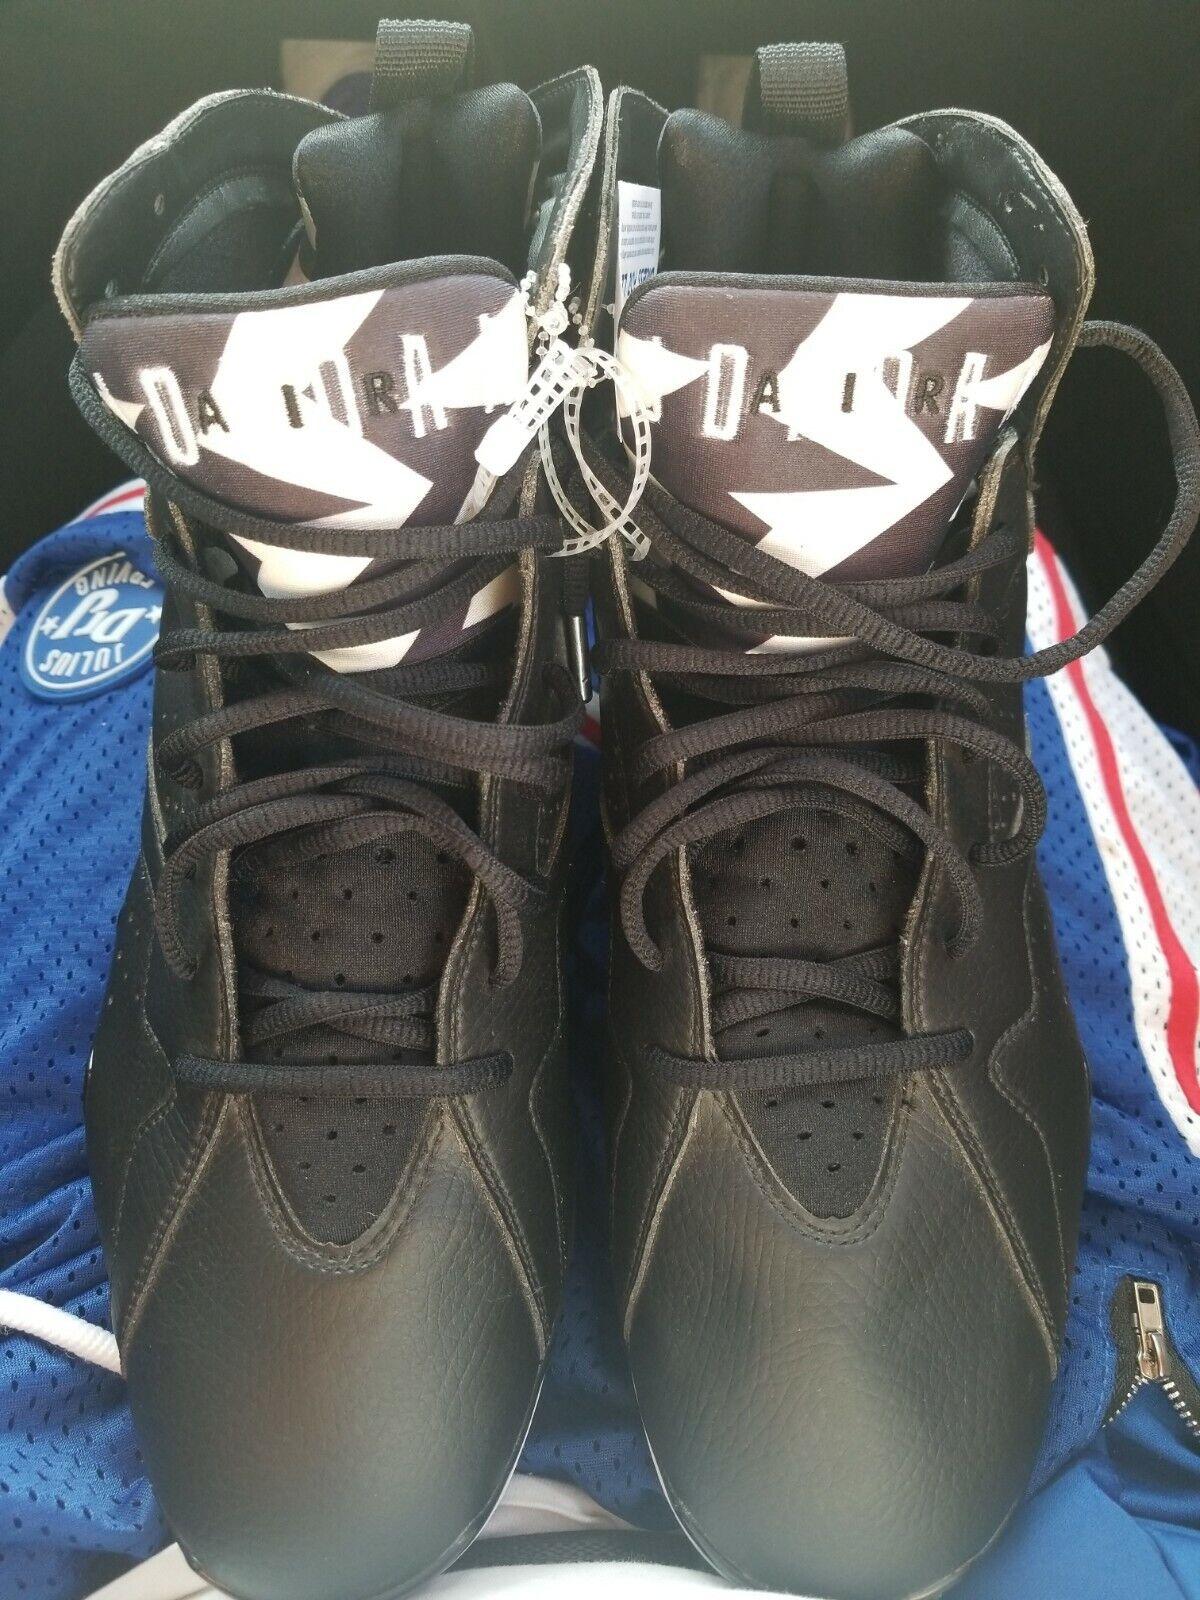 Permanente población Nathaniel Ward  Nike Air Jordan VII 7 Retro TD Football Cleats Black White Oreo Sz  (719543-010) 11 for sale online | eBay